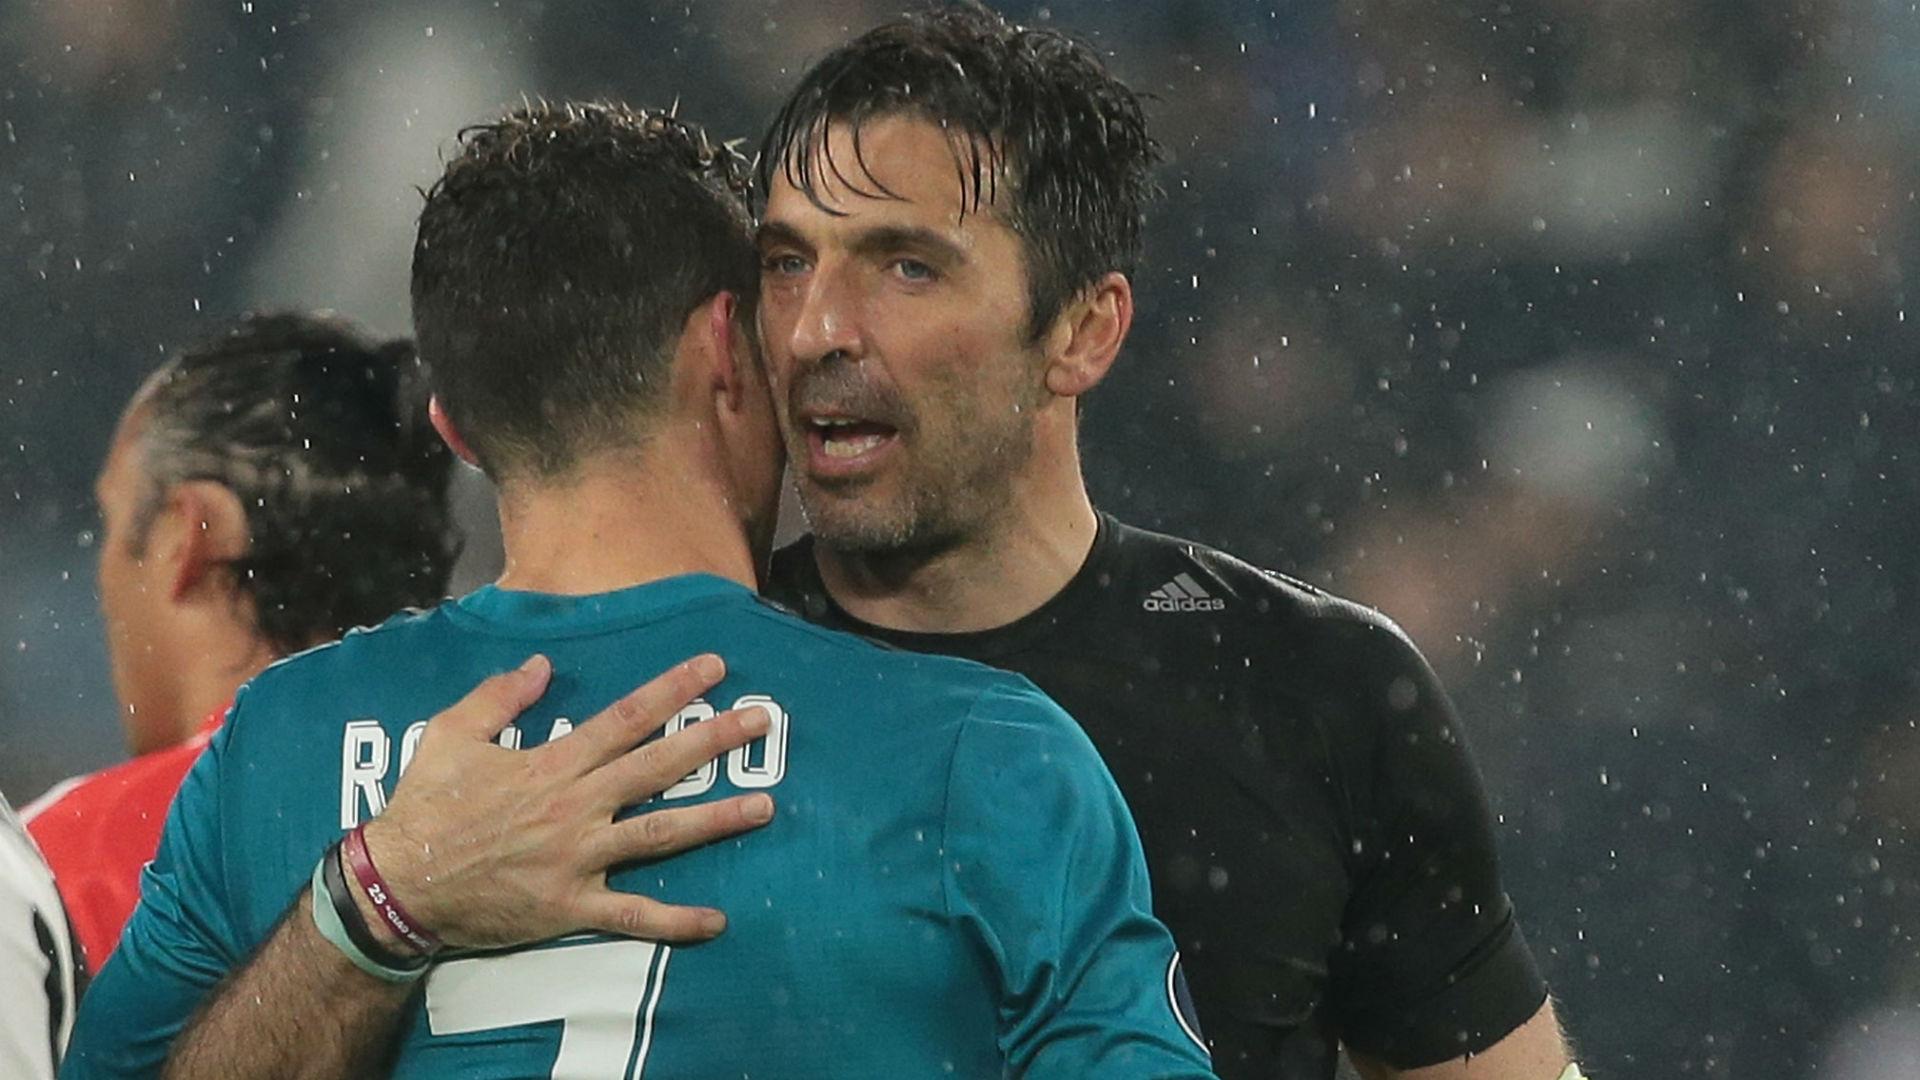 Buffon thanks Juventus for 'splendid gift' of playing with Ronaldo